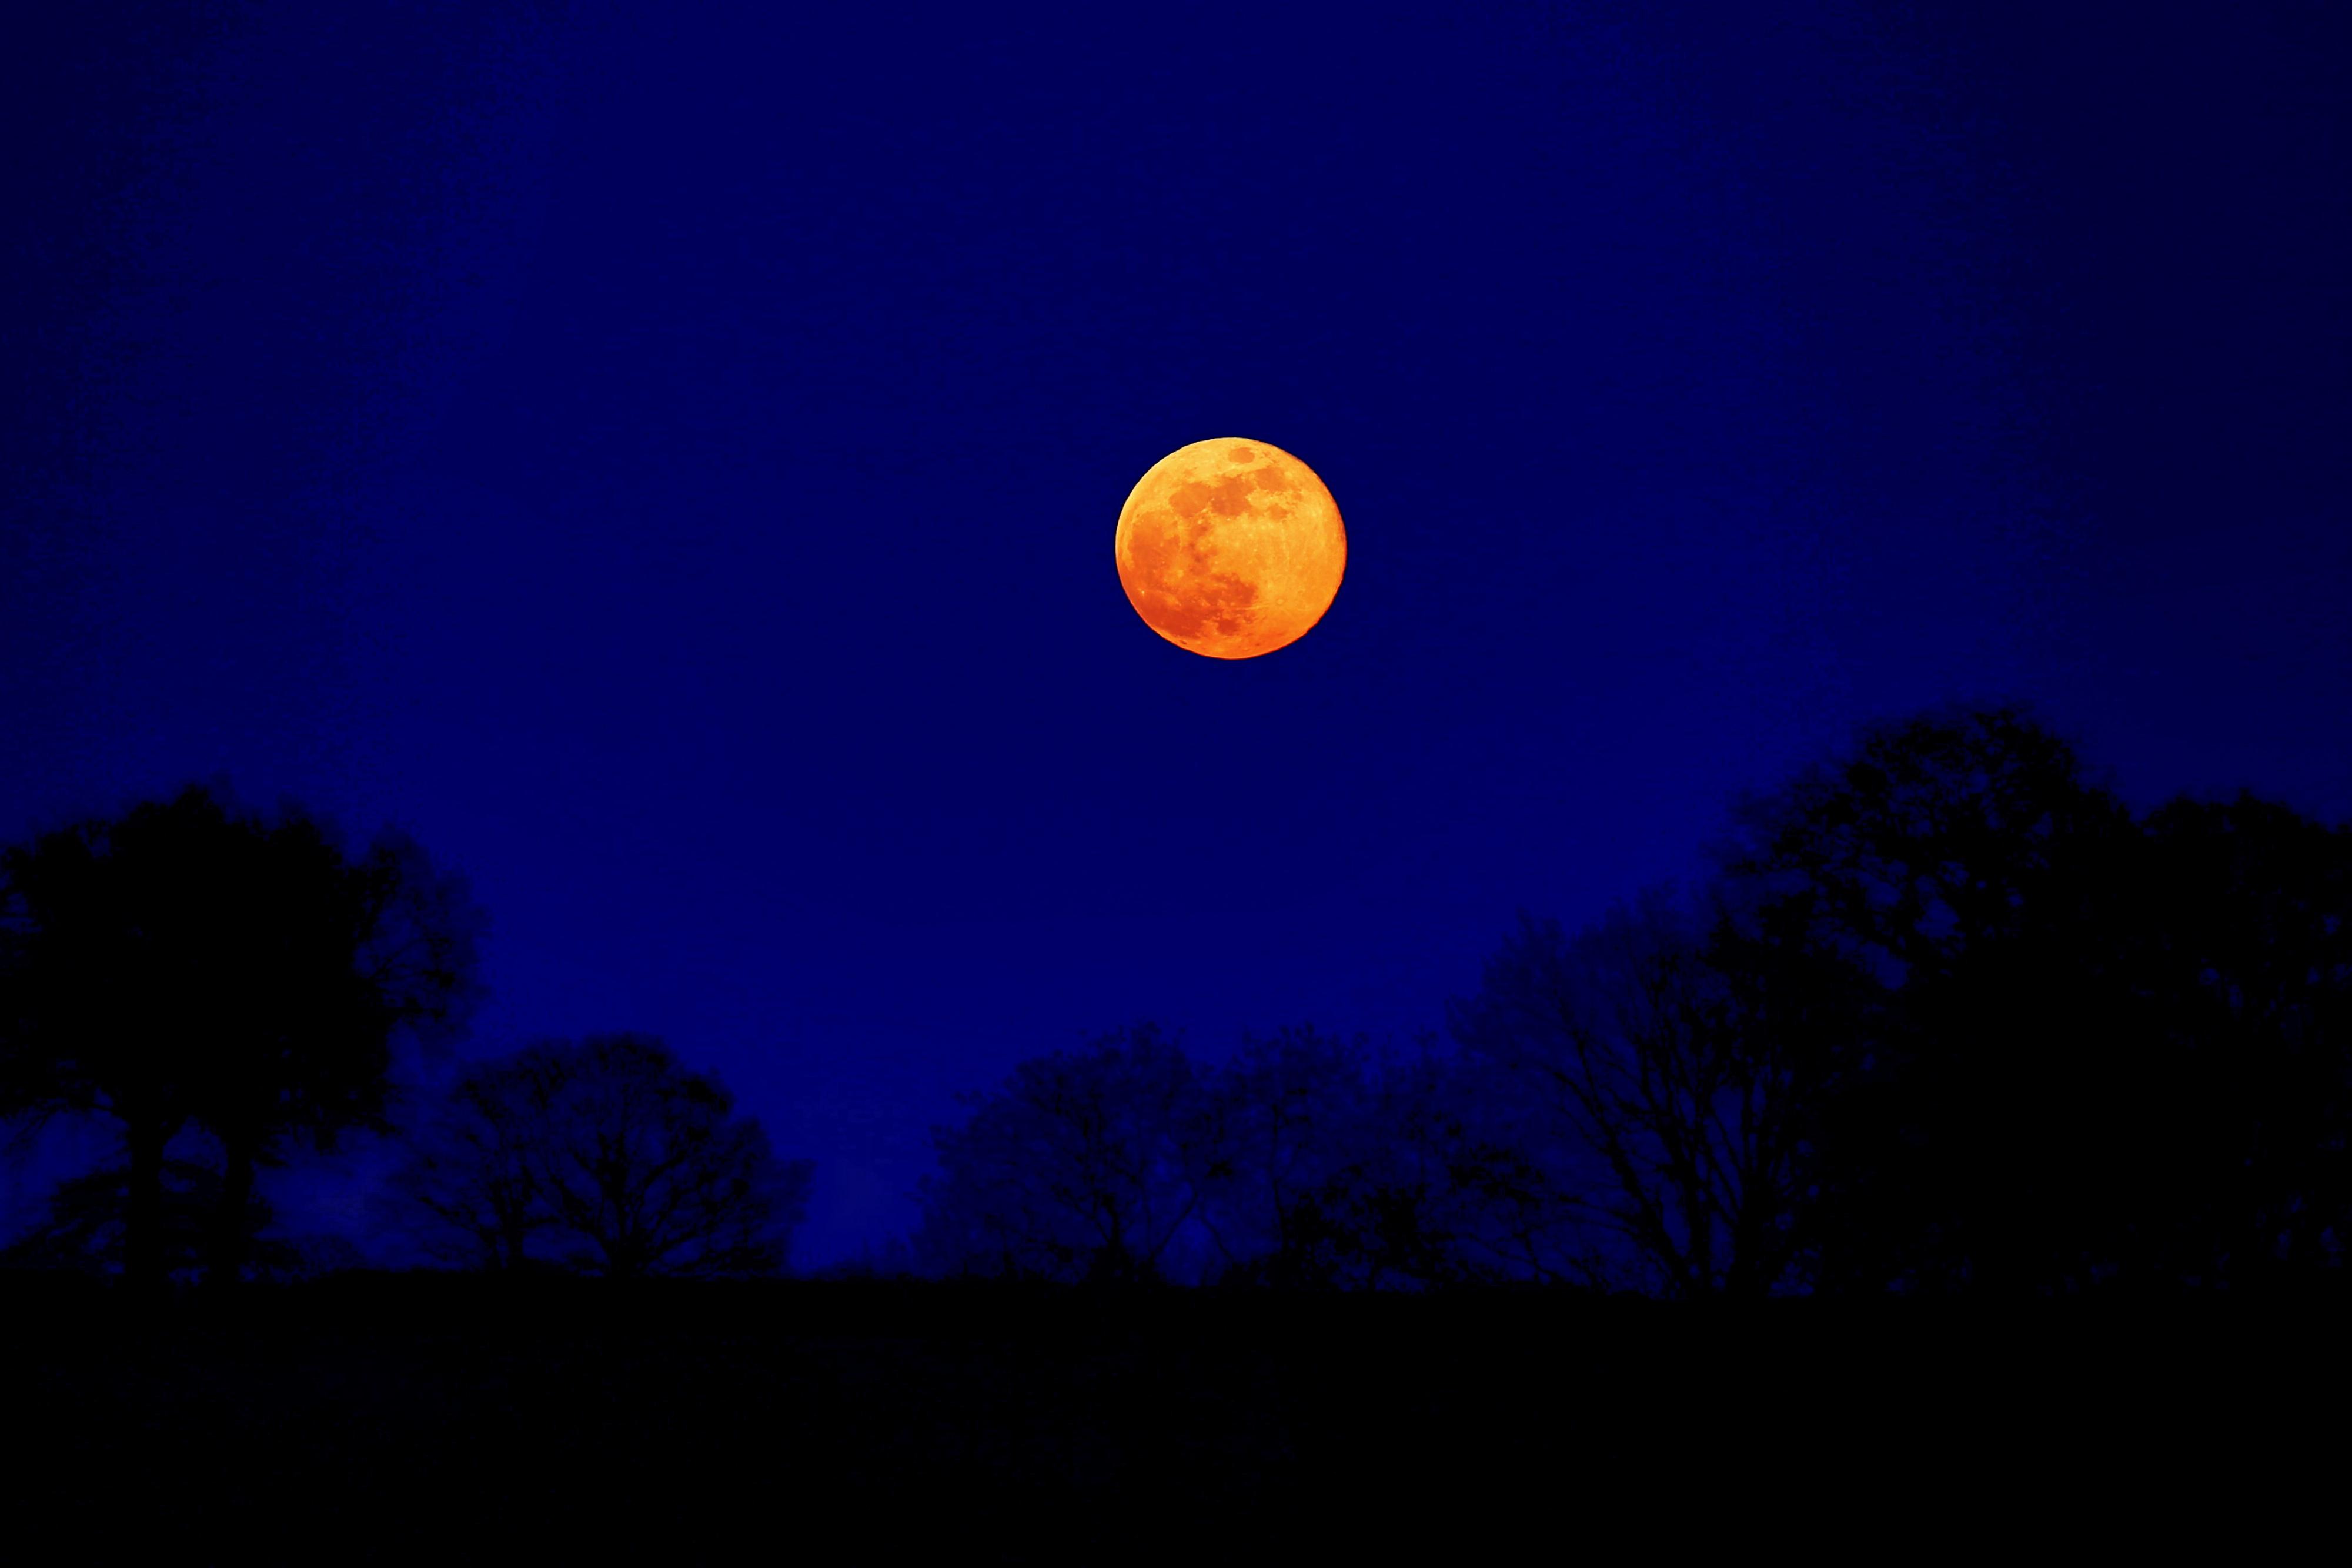 lever de la pleine lune le 19 avril 2019 21h09mn03s